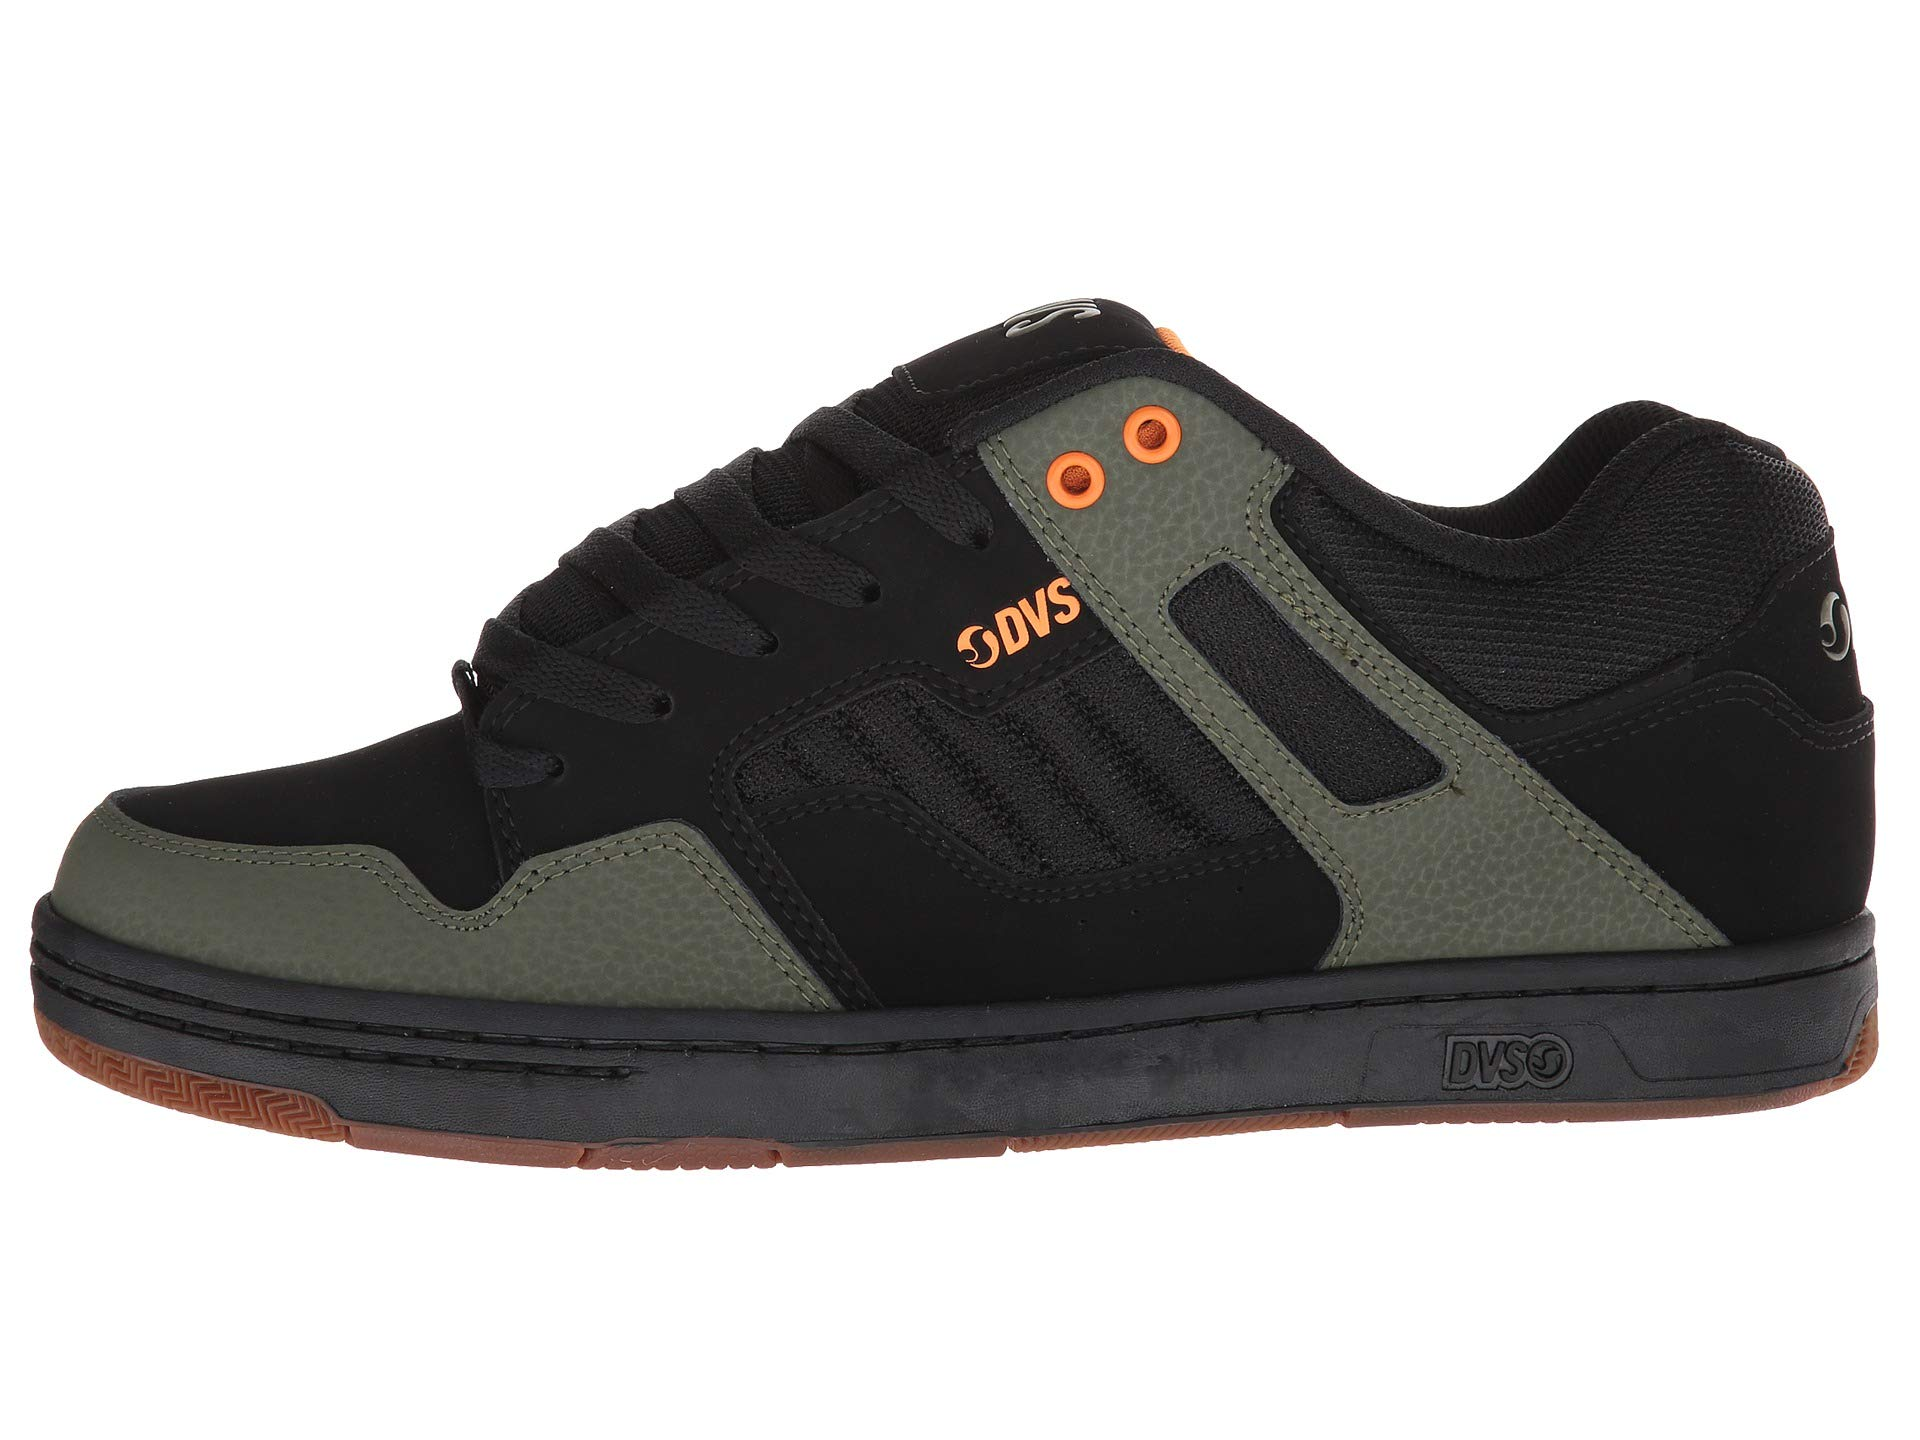 Shoe Dvs olive Enduro Company 125 Black 6qdfR0xwd